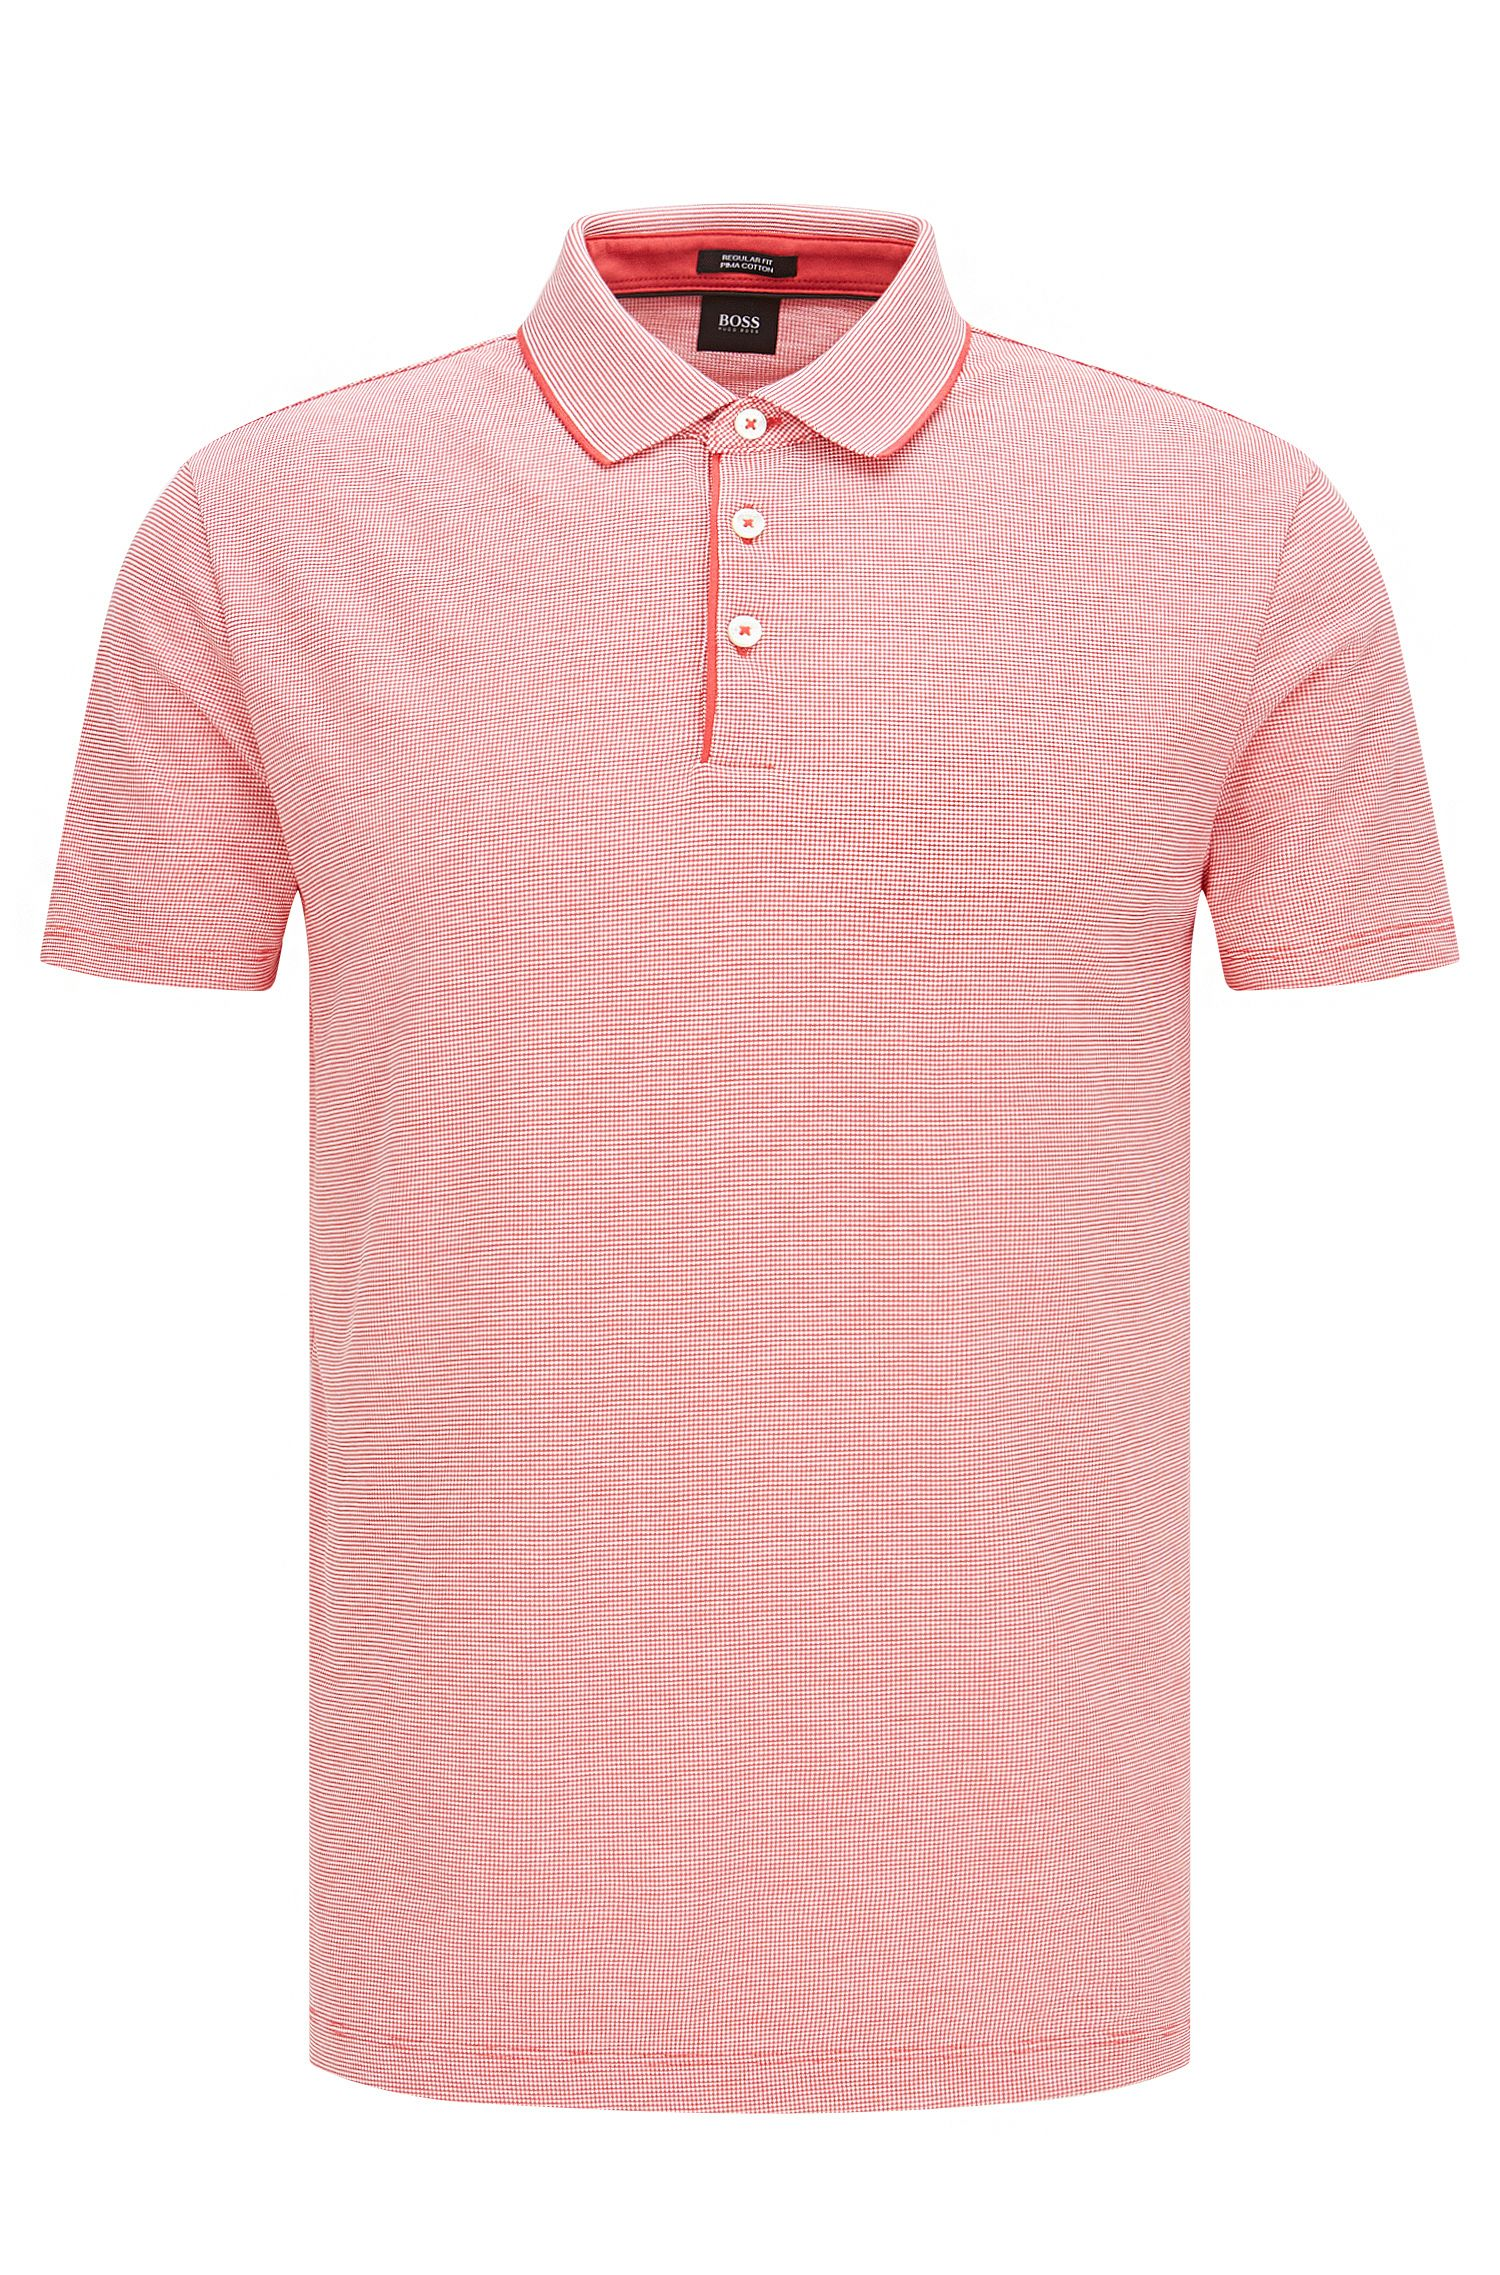 'Pack'   Regular Fit, Pima Cotton Polo Shirt